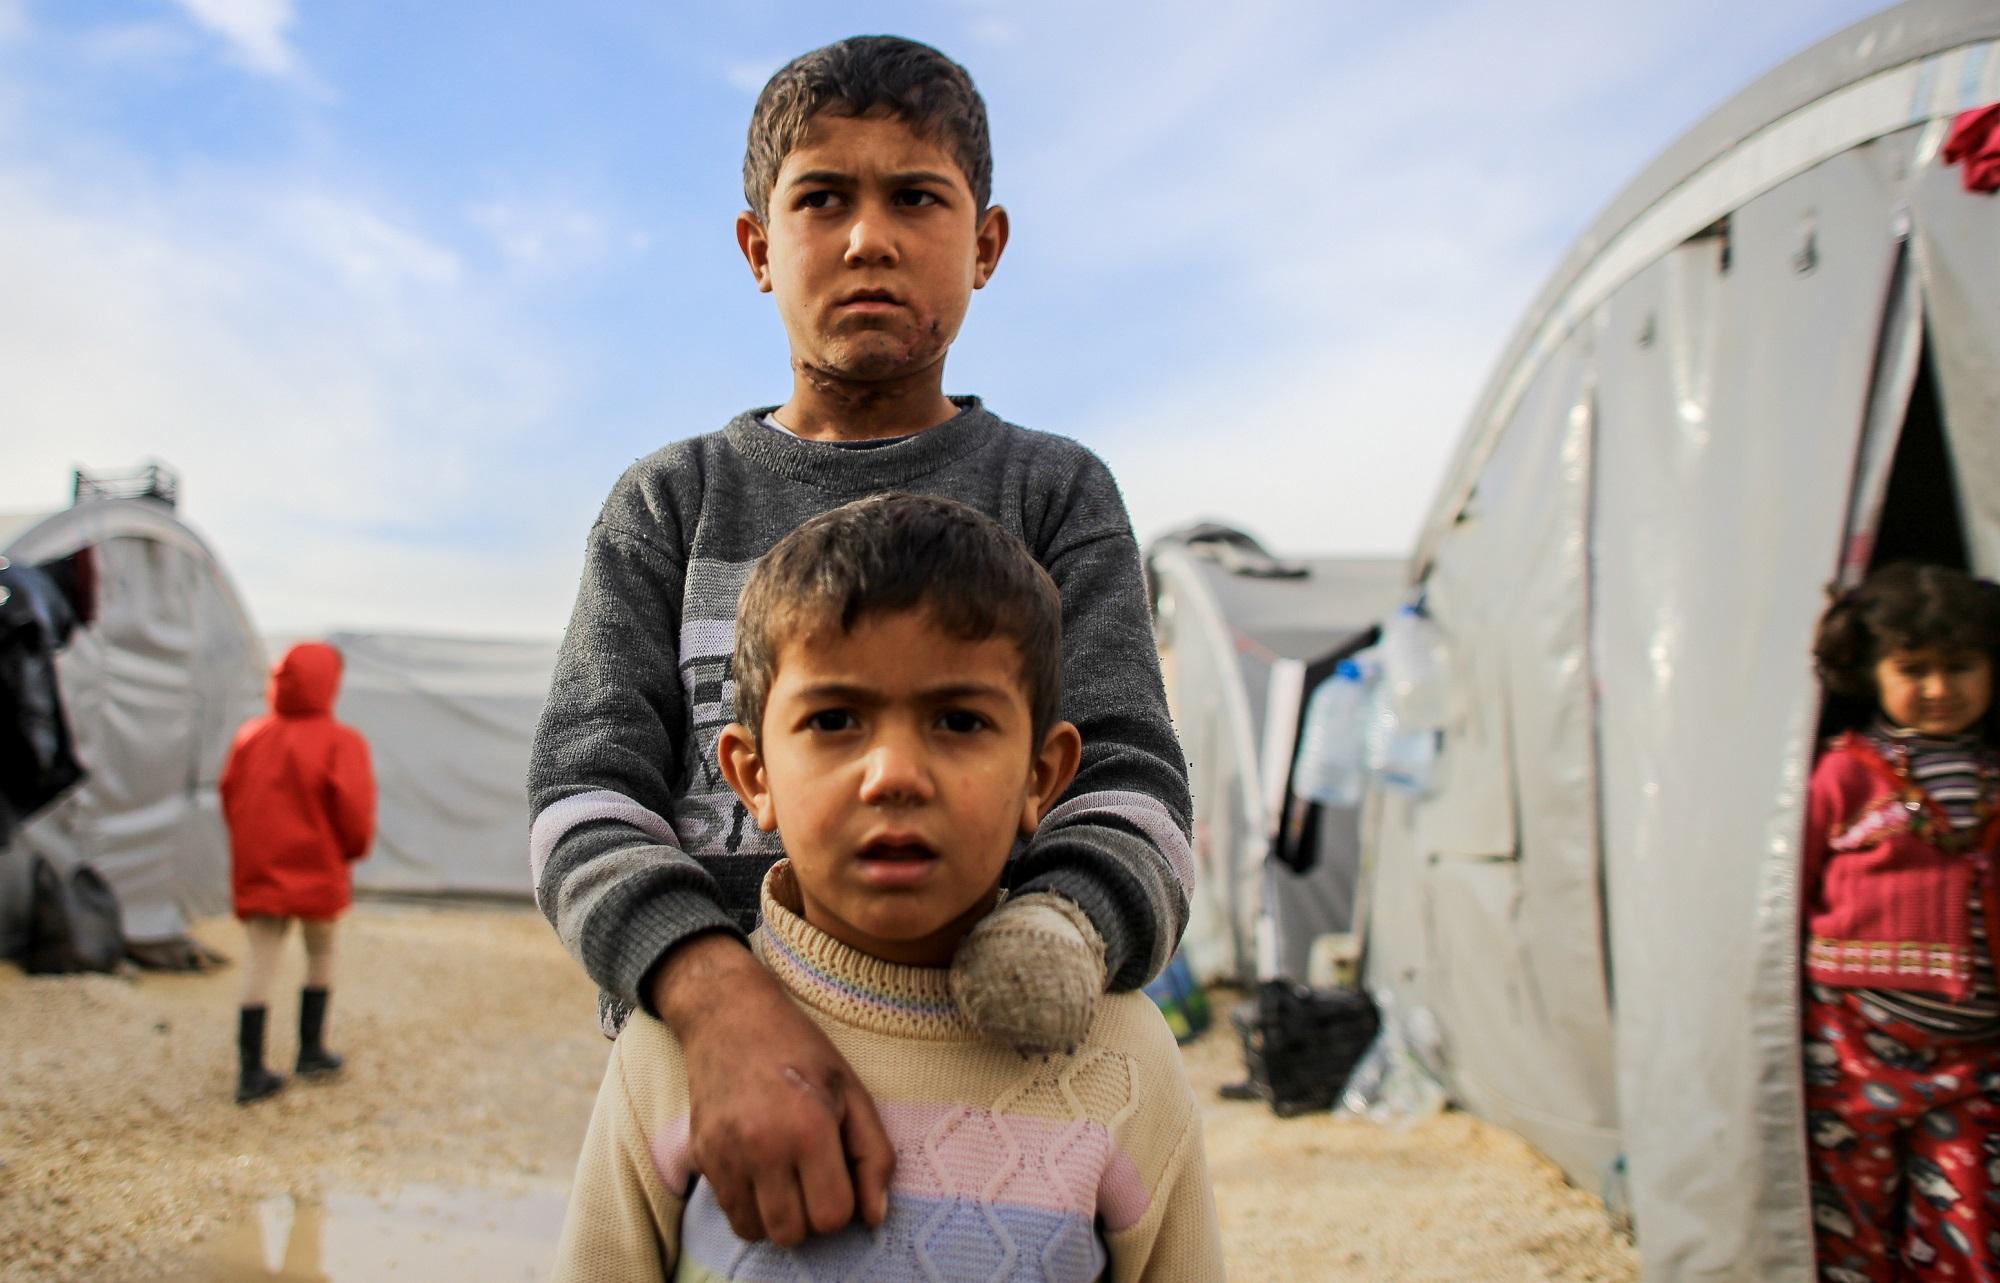 Kinder als Kriegsopfer